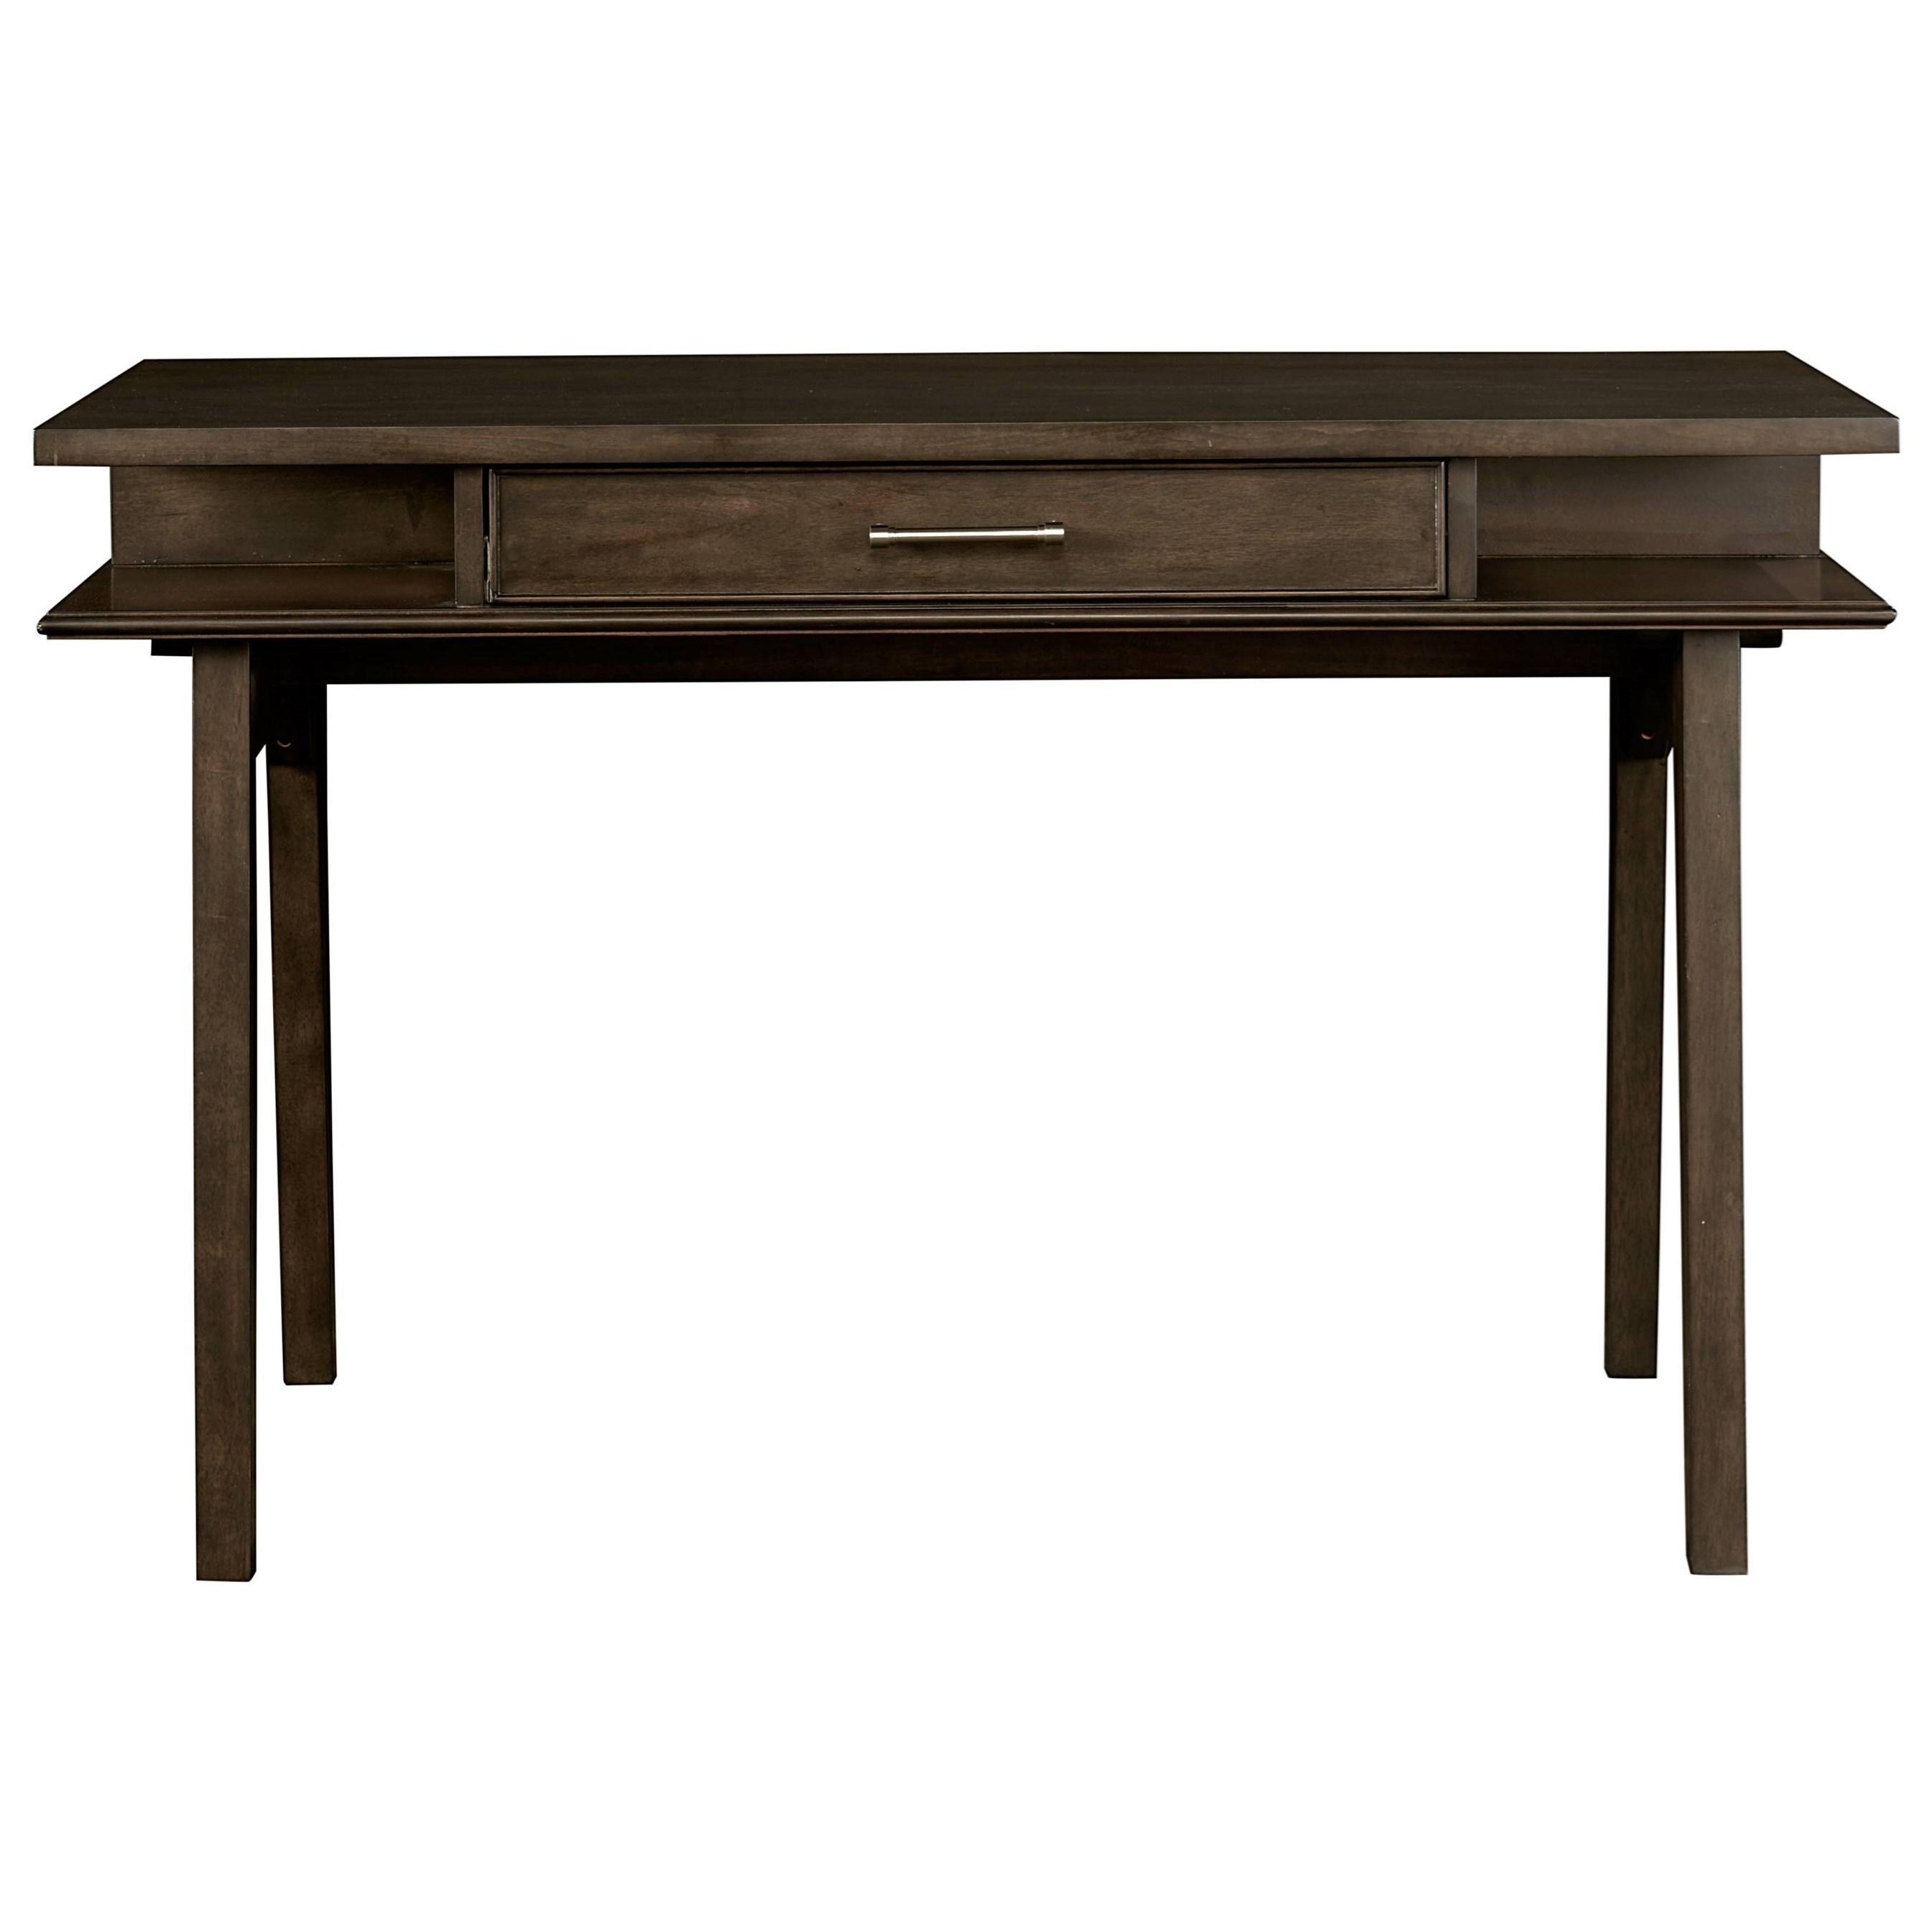 chelsea square sofa decorate living room white leather stone leigh furniture desk belfort squaredesk